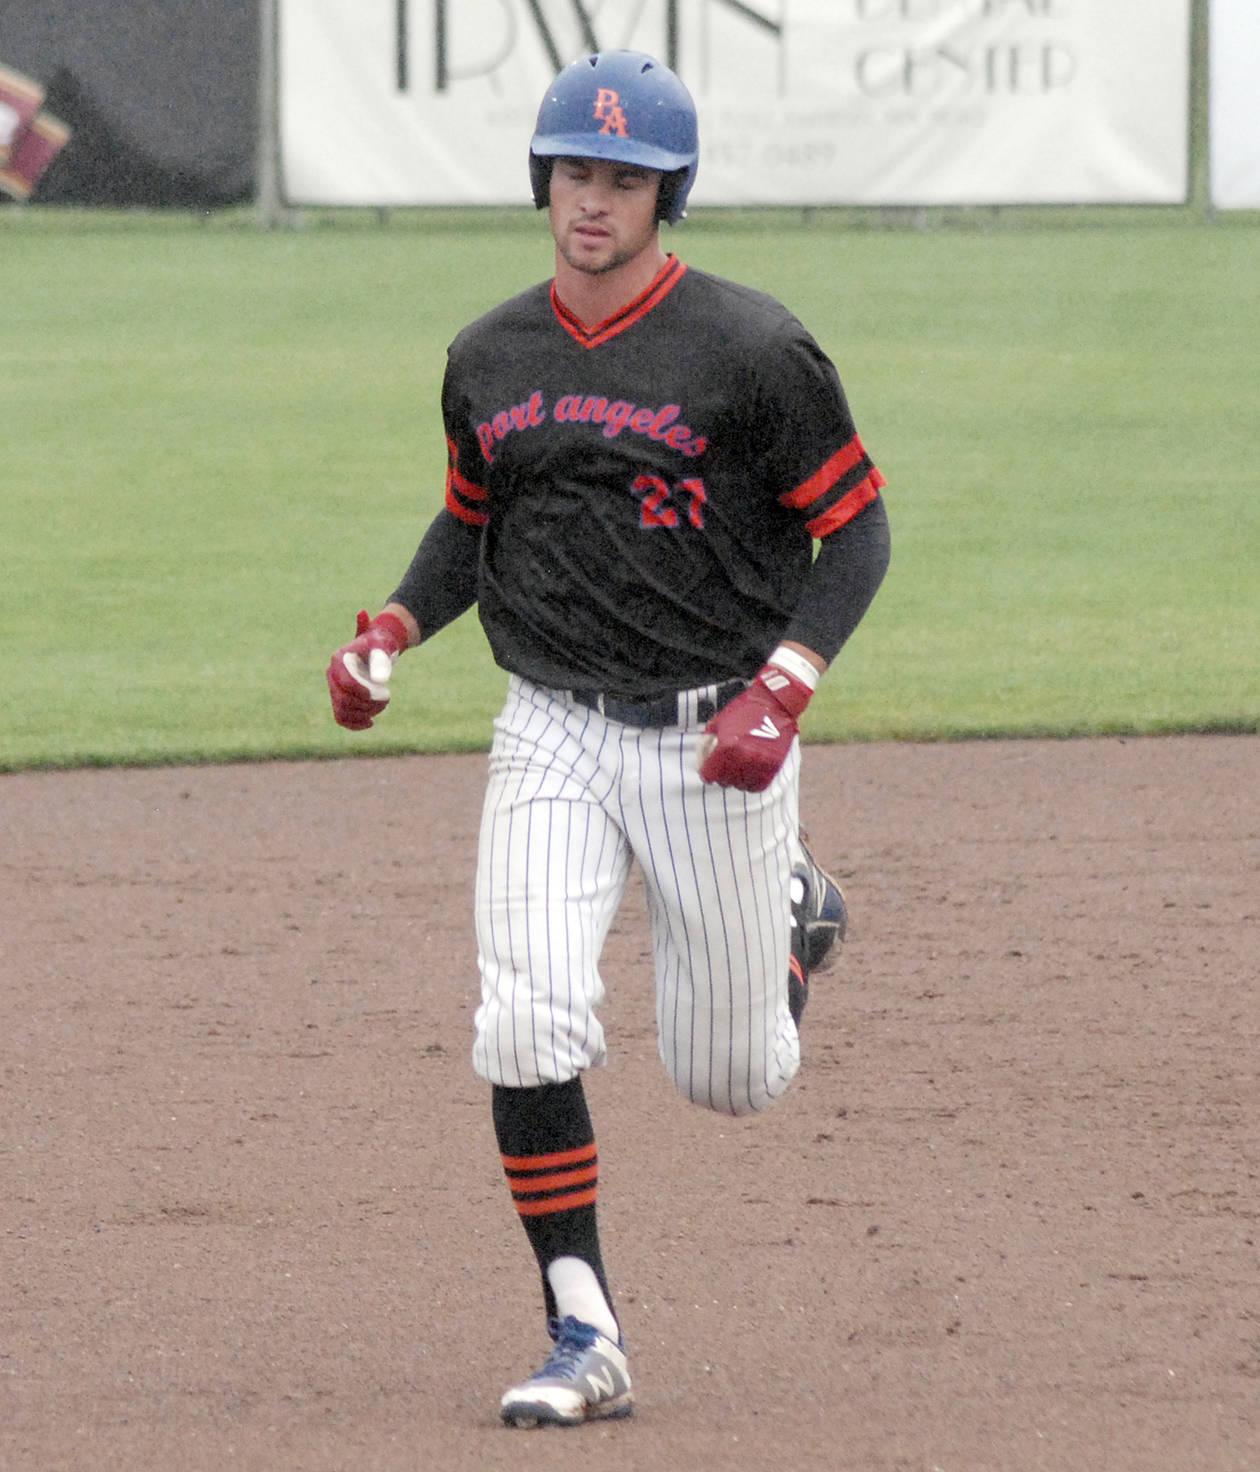 LEFTIES: Kinsky, Chavez team on 3-hitter as Port Angeles wins pitchers' duel